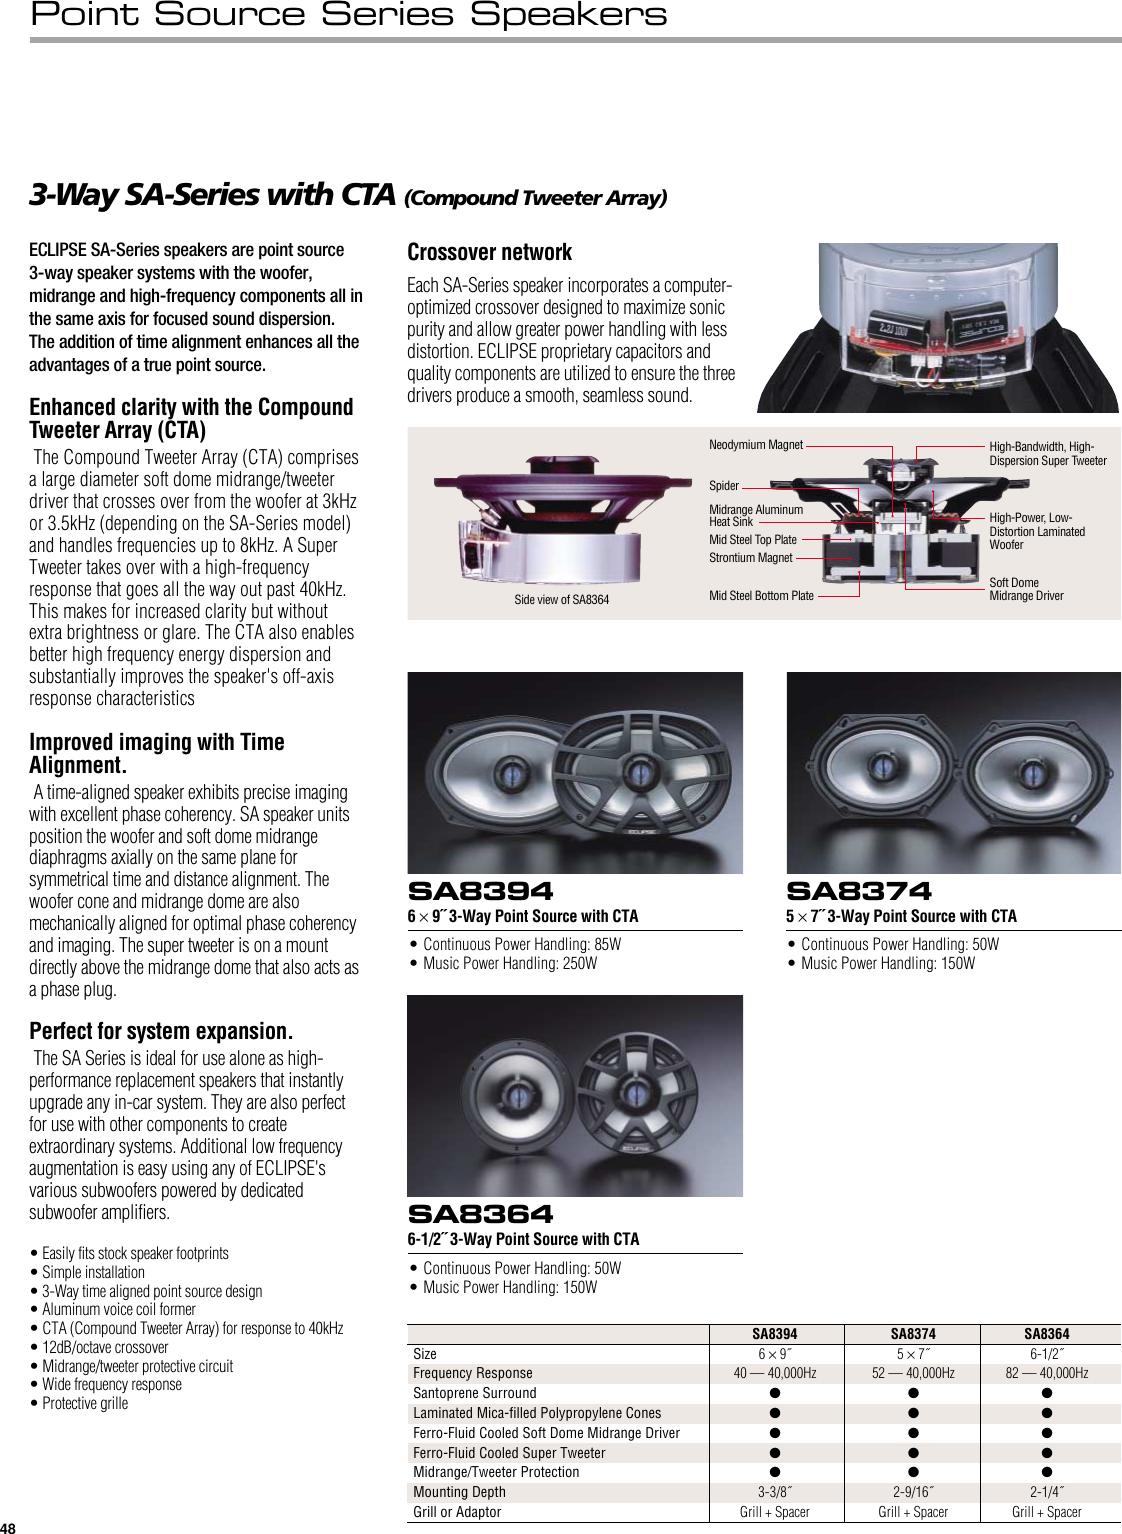 Eclipse Fujitsu Ten Aex403 Users Manual